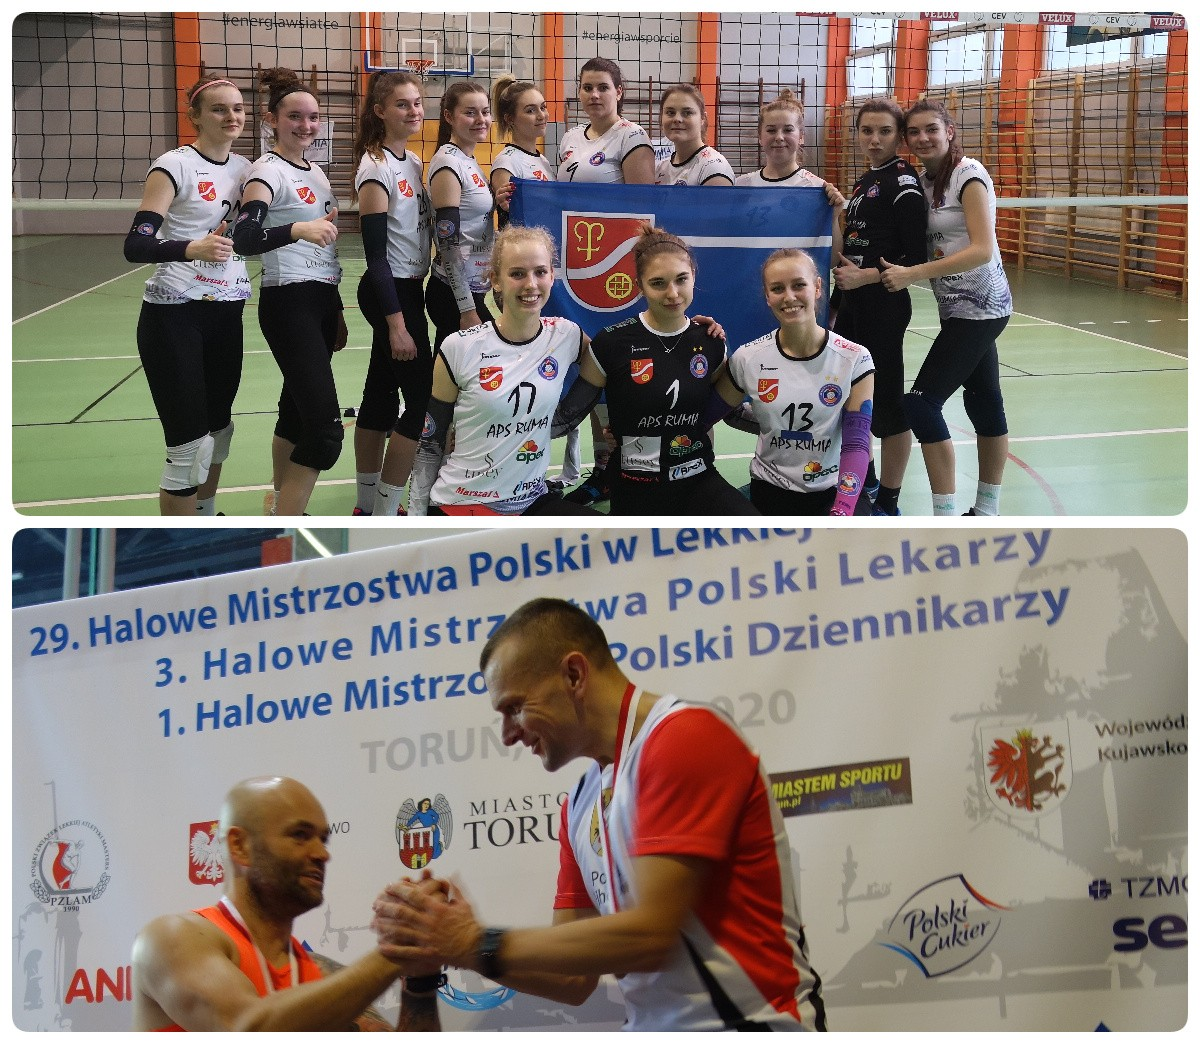 Kolejne sportowe sukcesy rumian